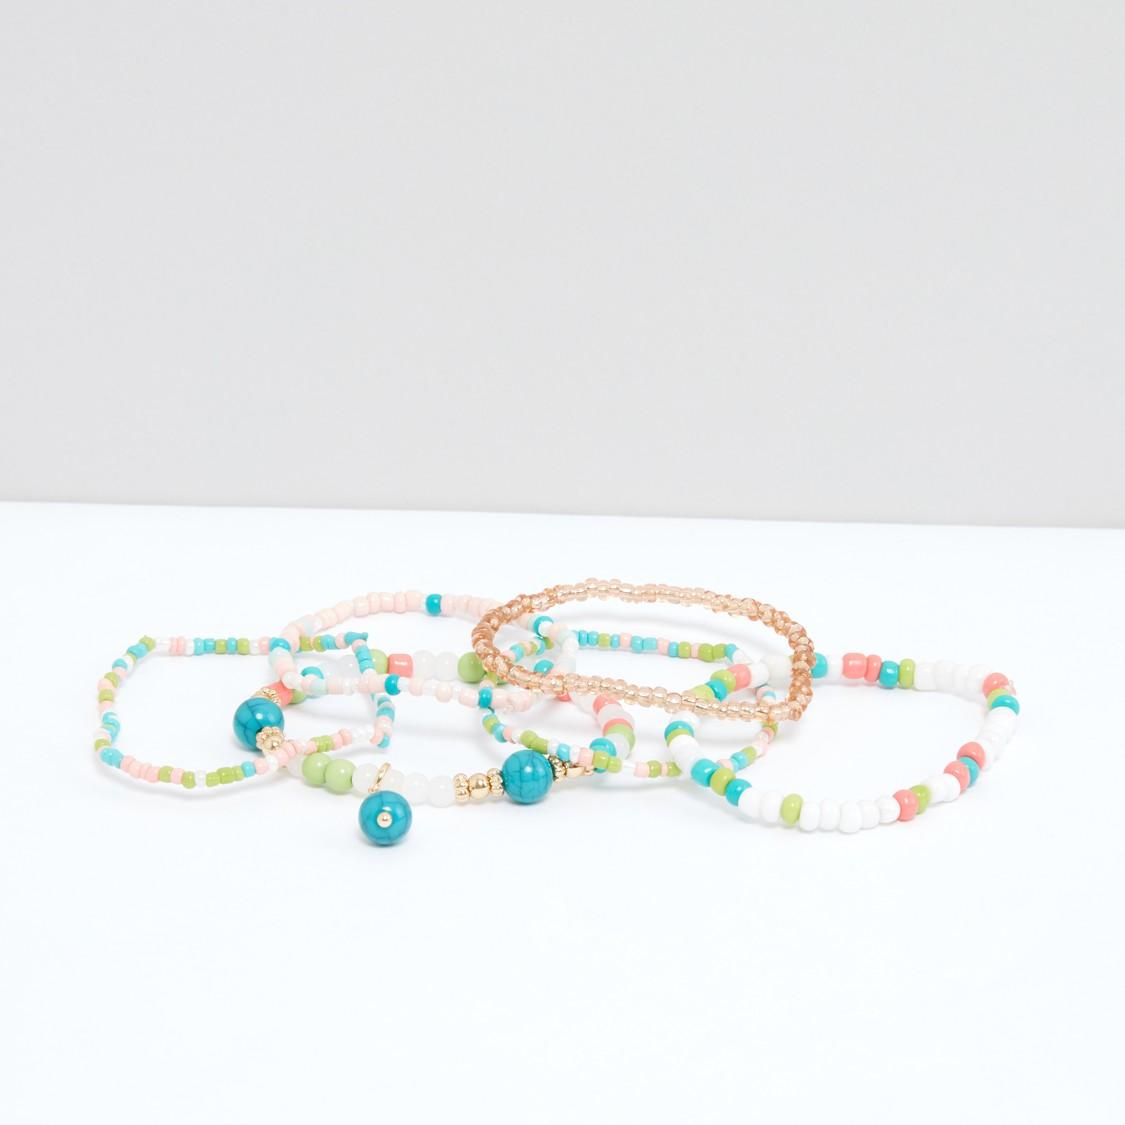 Beaded Bracelets - Set of 6